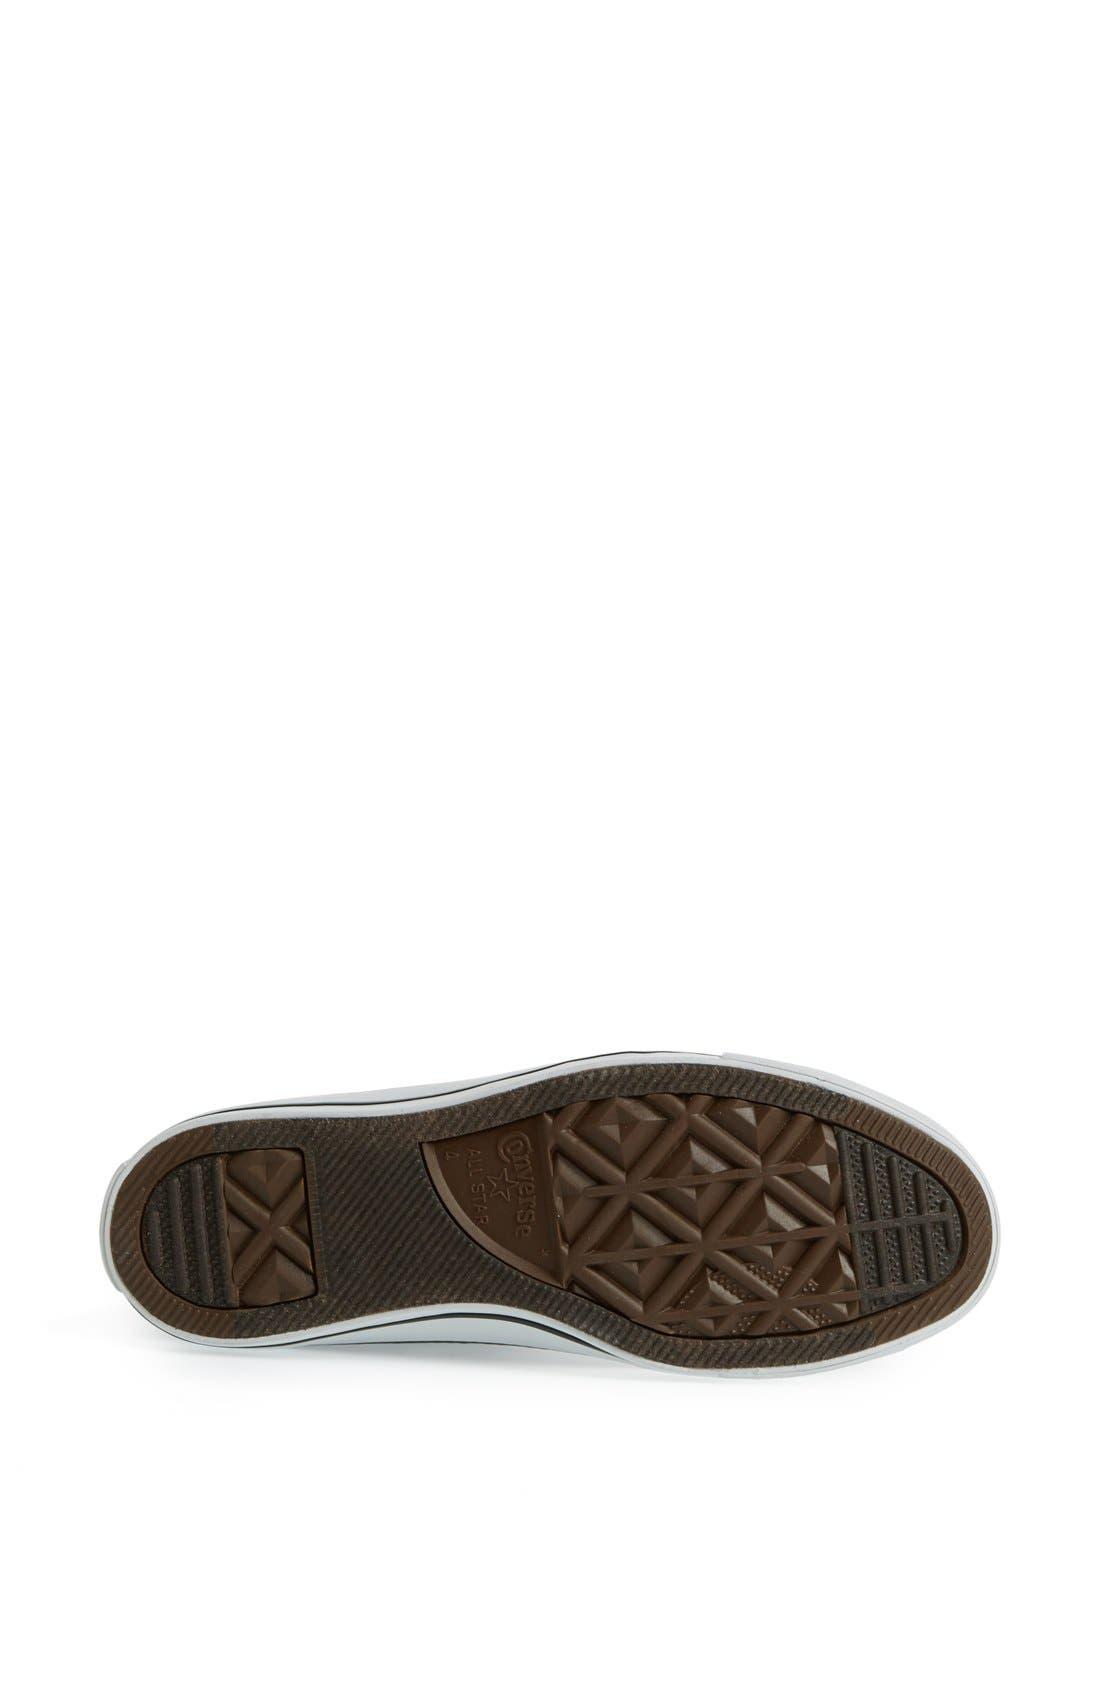 Alternate Image 3  - Converse Chuck Taylor® All Star® 'Tie Dye' High Top Sneaker (Women)